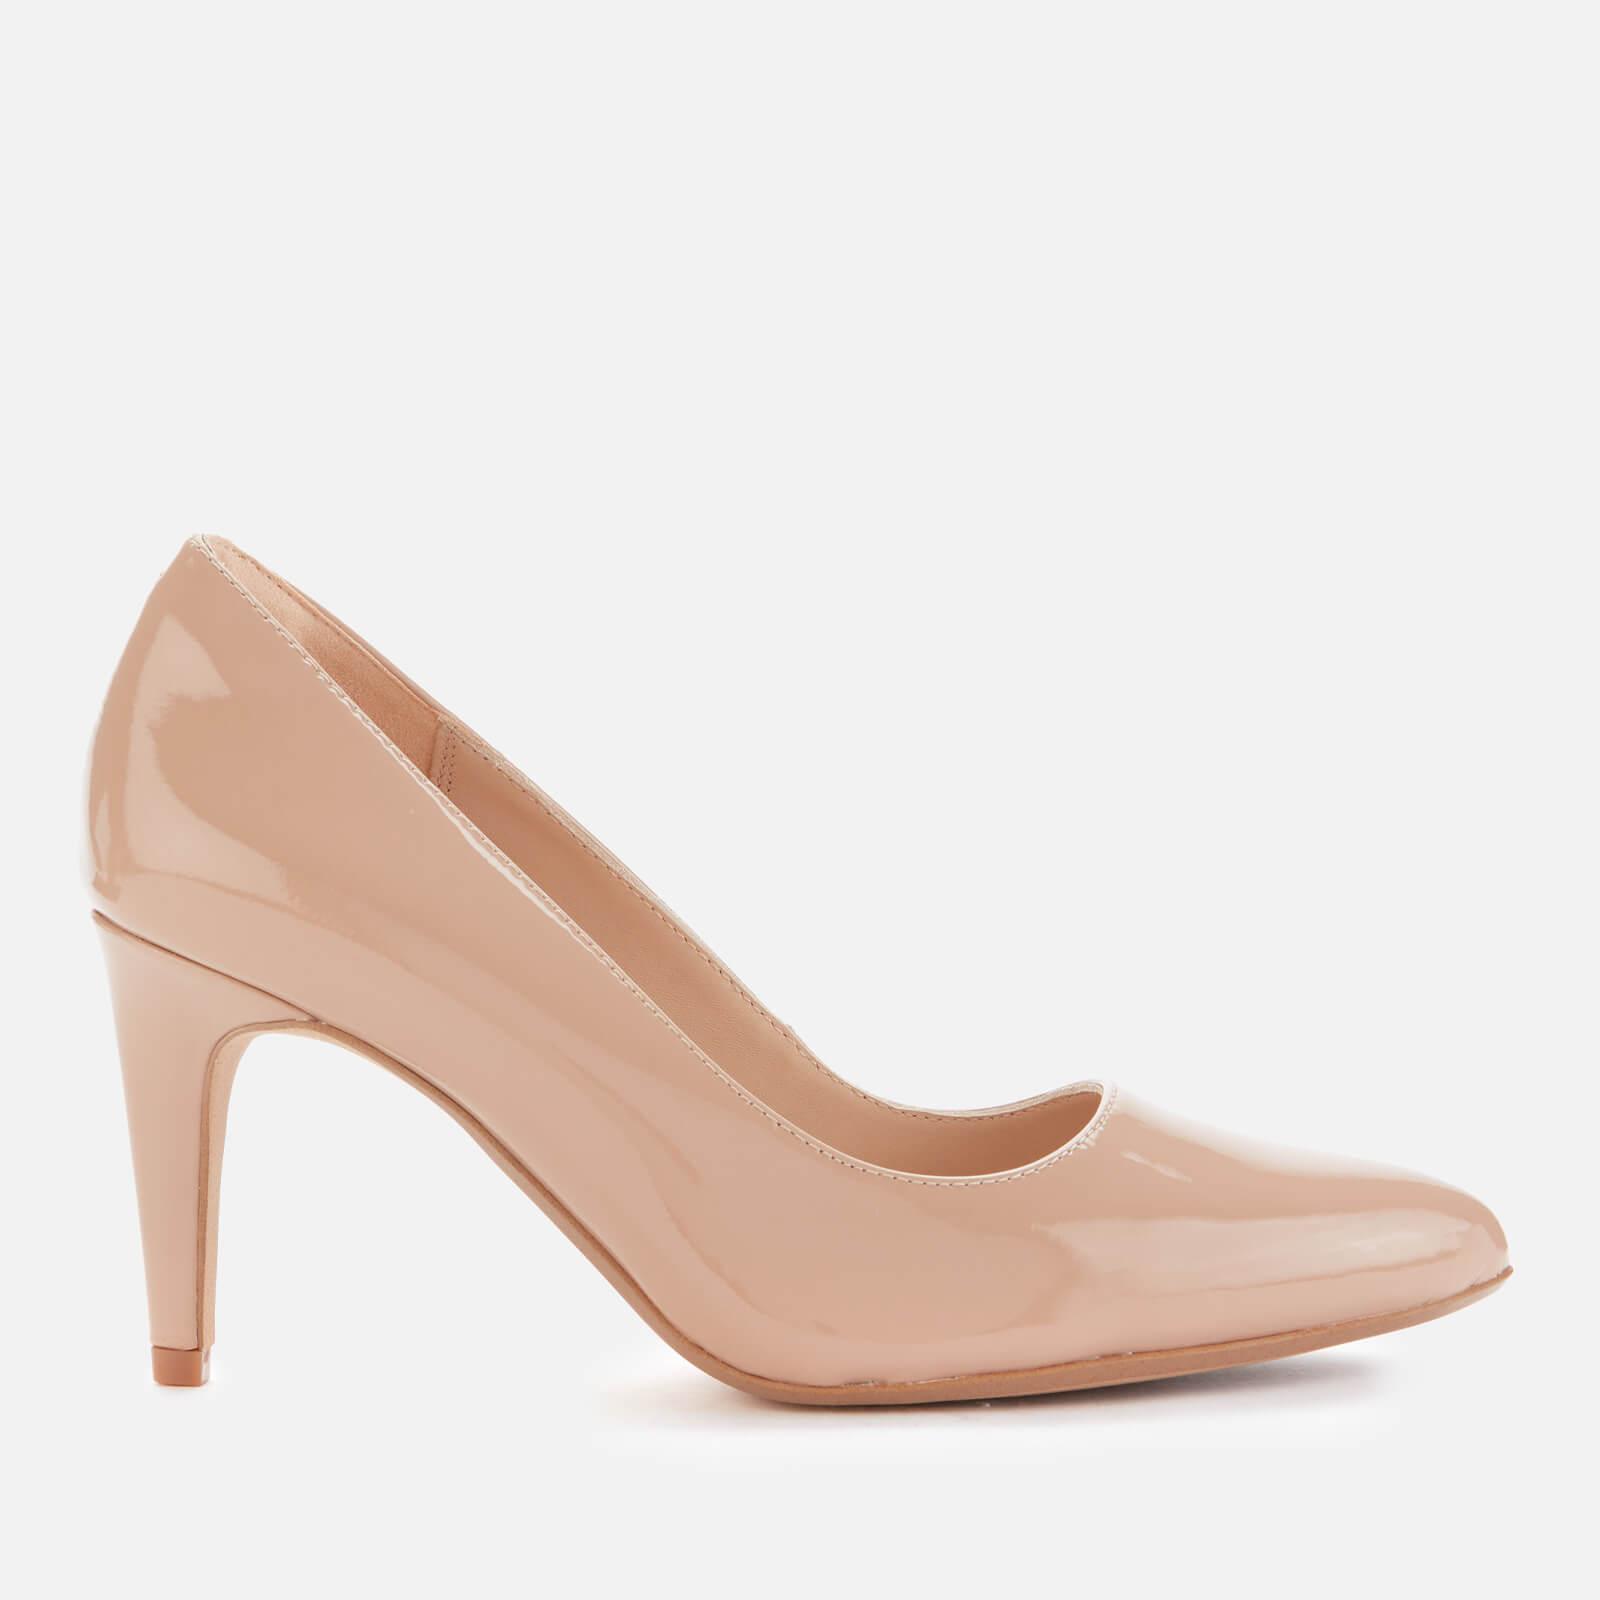 Clarks Women's Laina Rae 2 Patent Leather Court Shoes - Praline - Uk 8